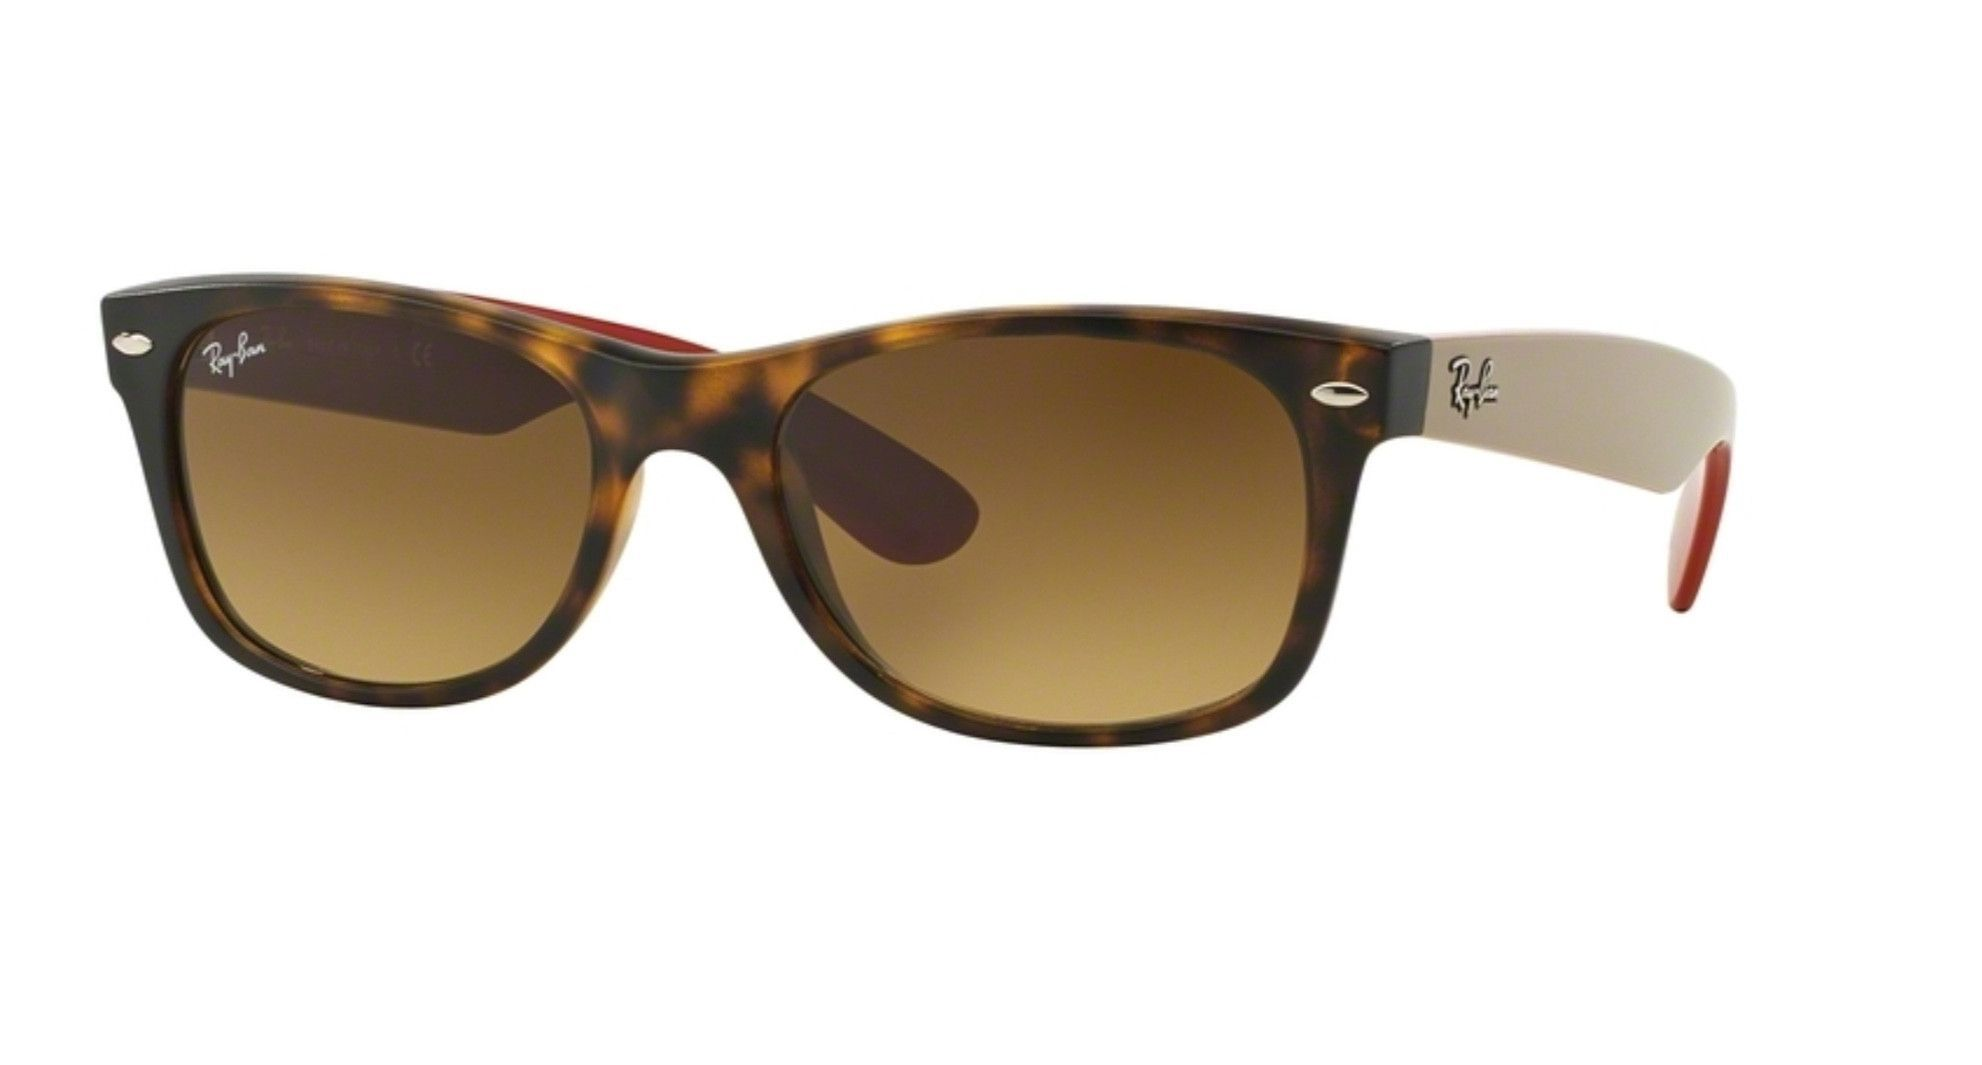 Ray Ban RB2131 618185 Matte Havana New Wayfarer Sunglasses